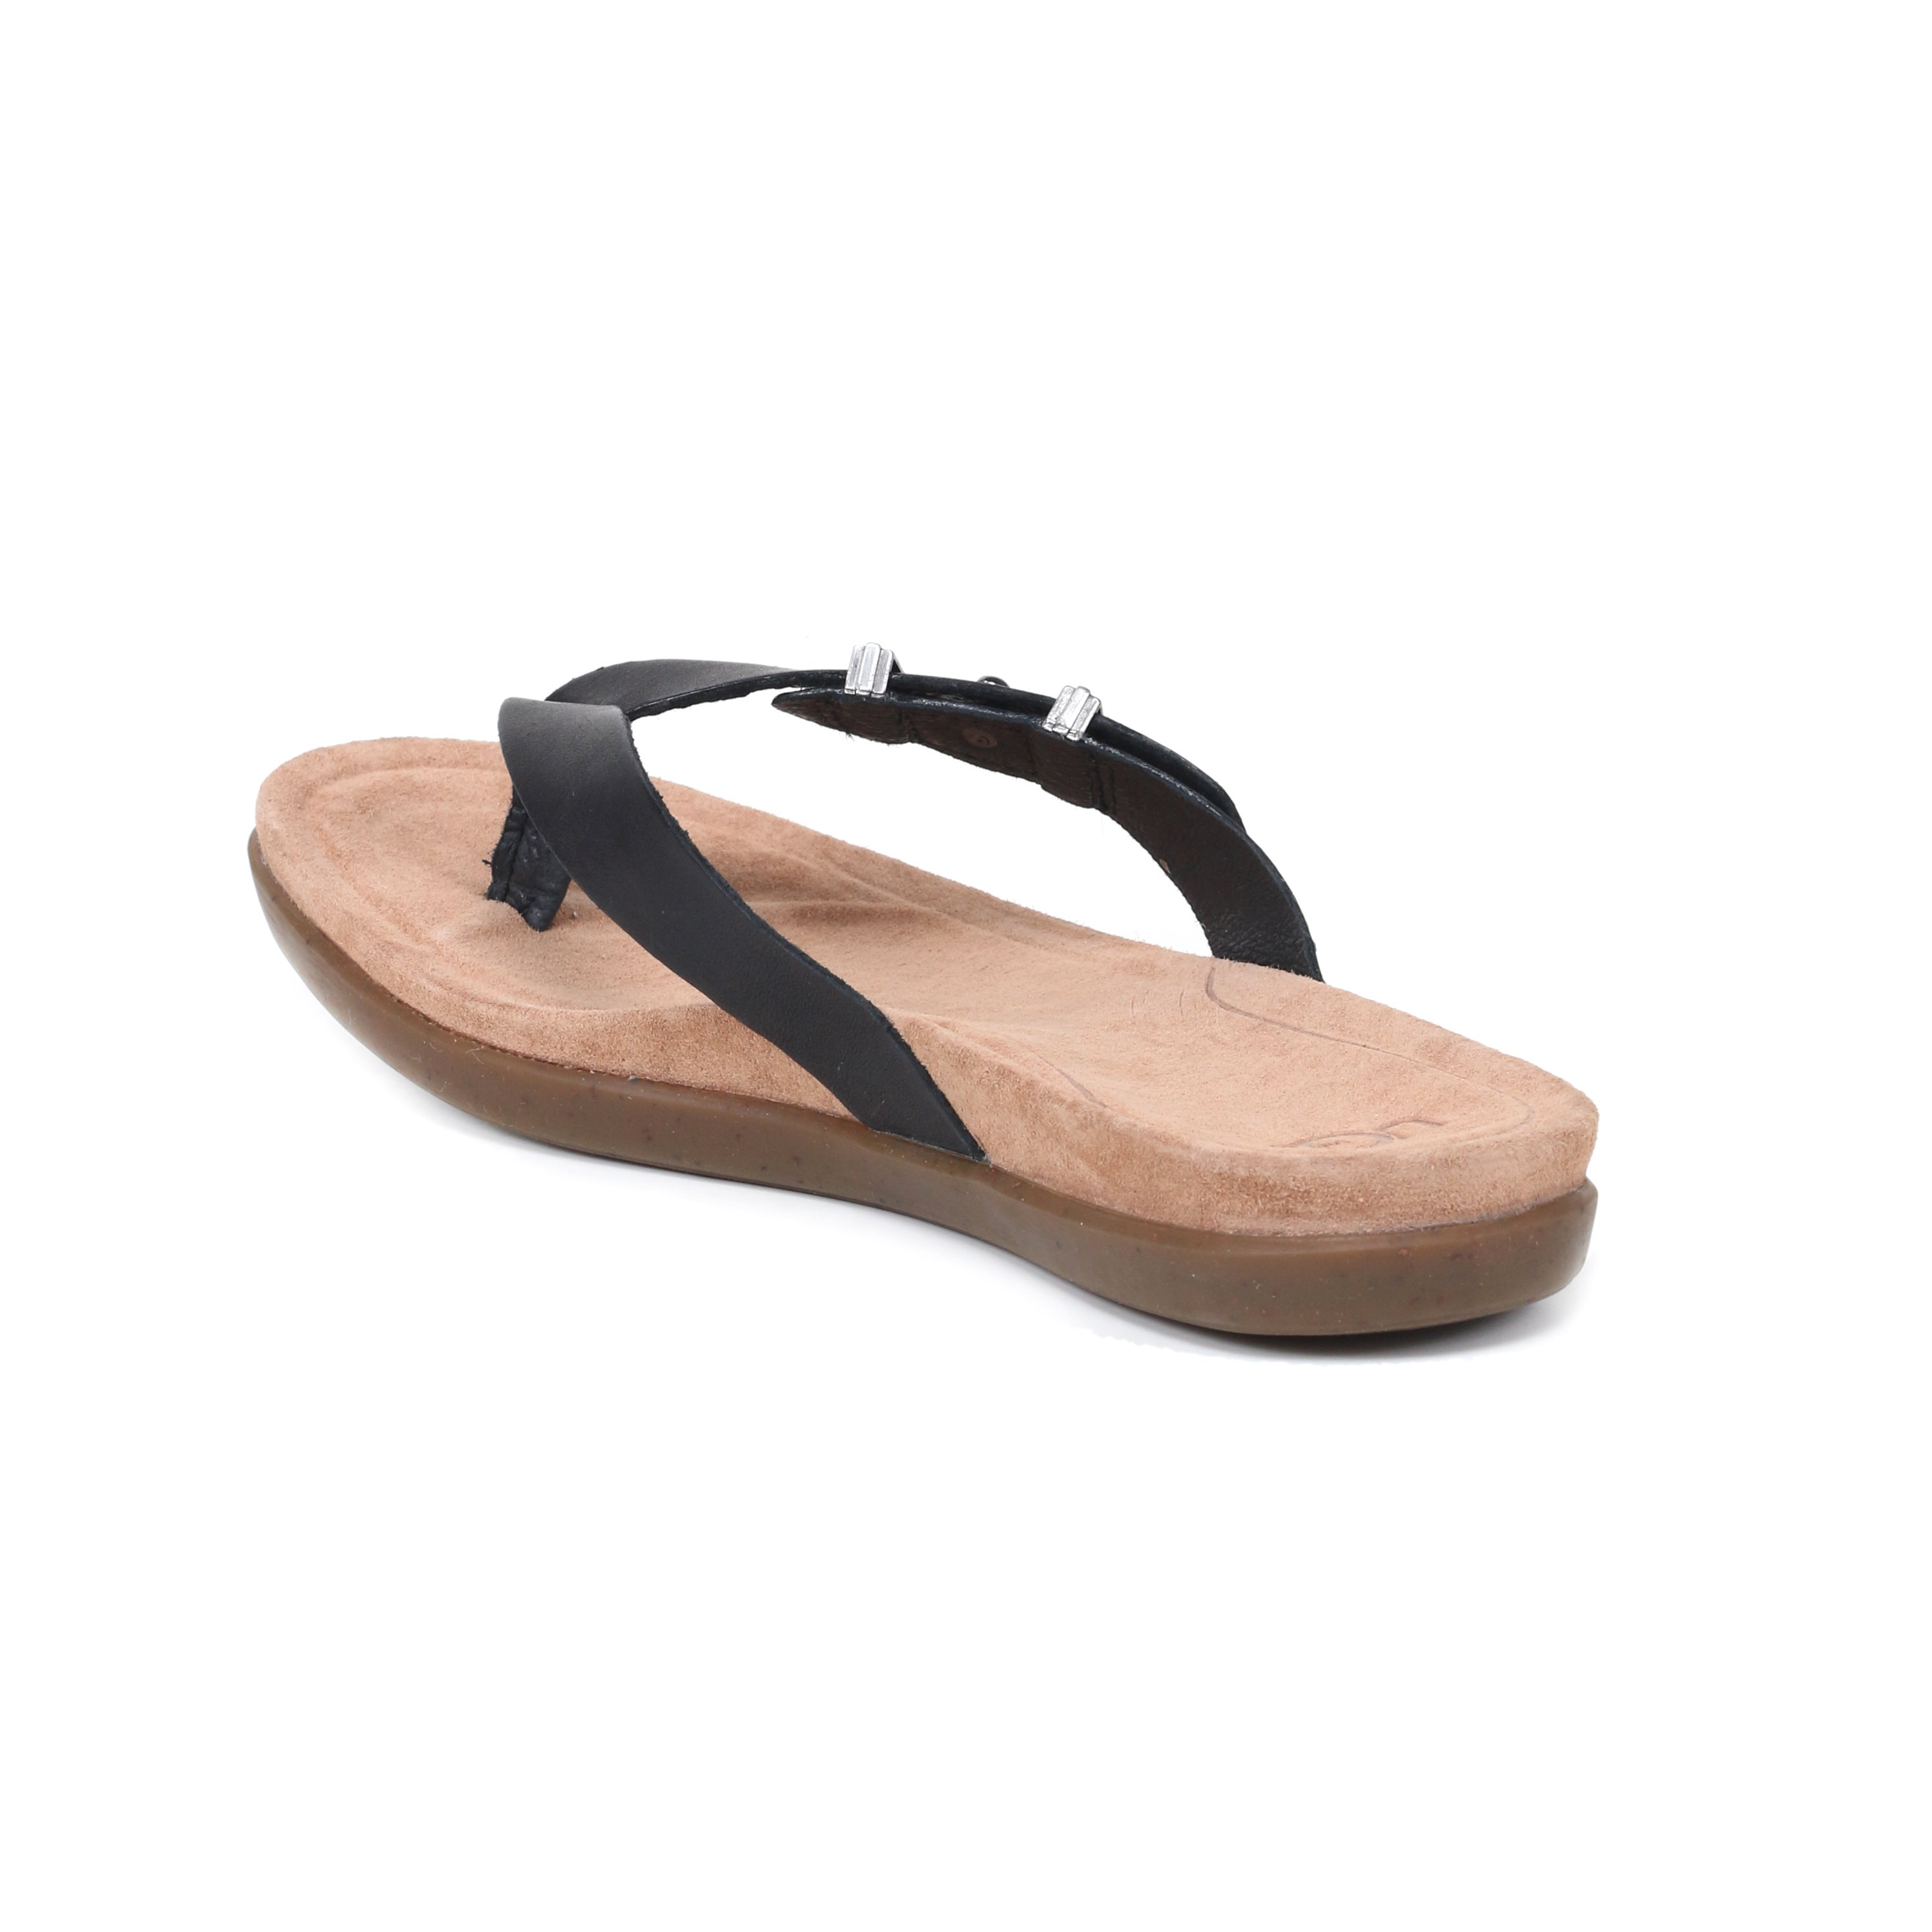 6aabf11eb11 UGG Australia Women's Black Sela Sandals